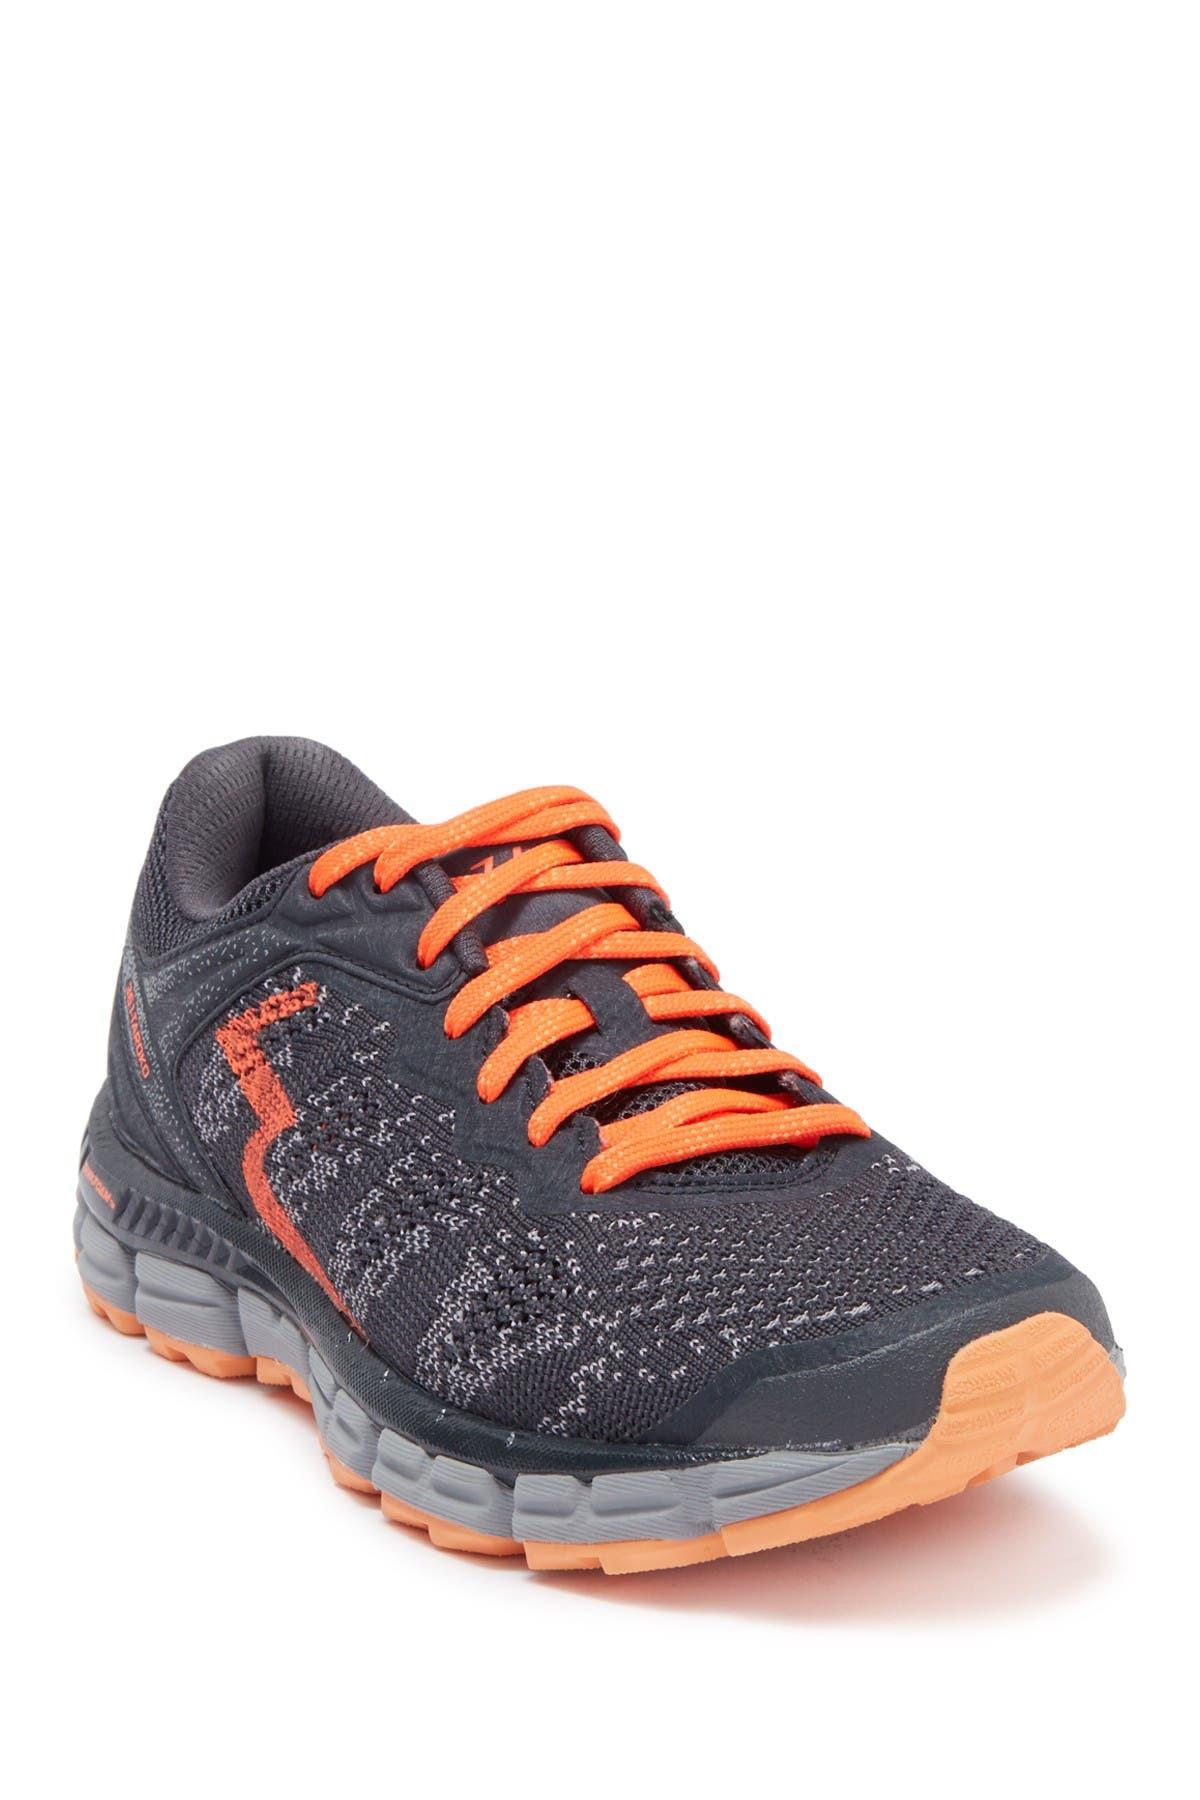 Image of 361 Degrees Taroko Running Sneaker